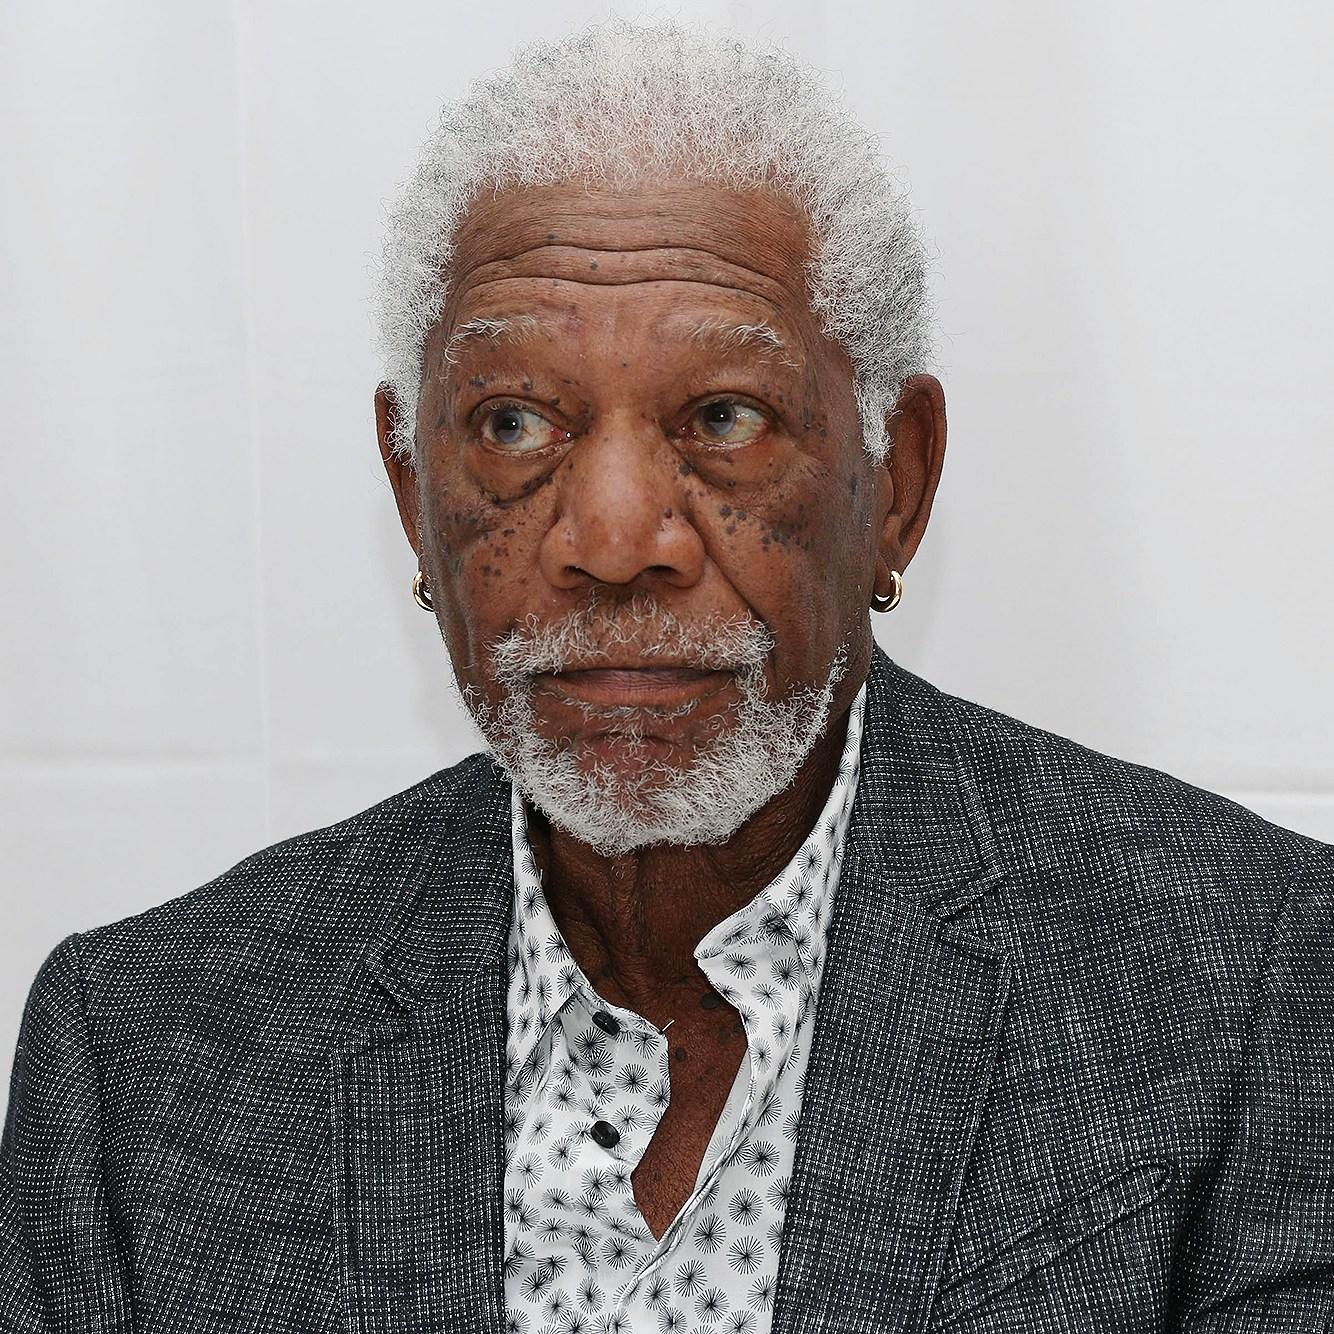 Morgan Freeman, Sexual Harassment, Inappropriate Behavior, Twitter Response